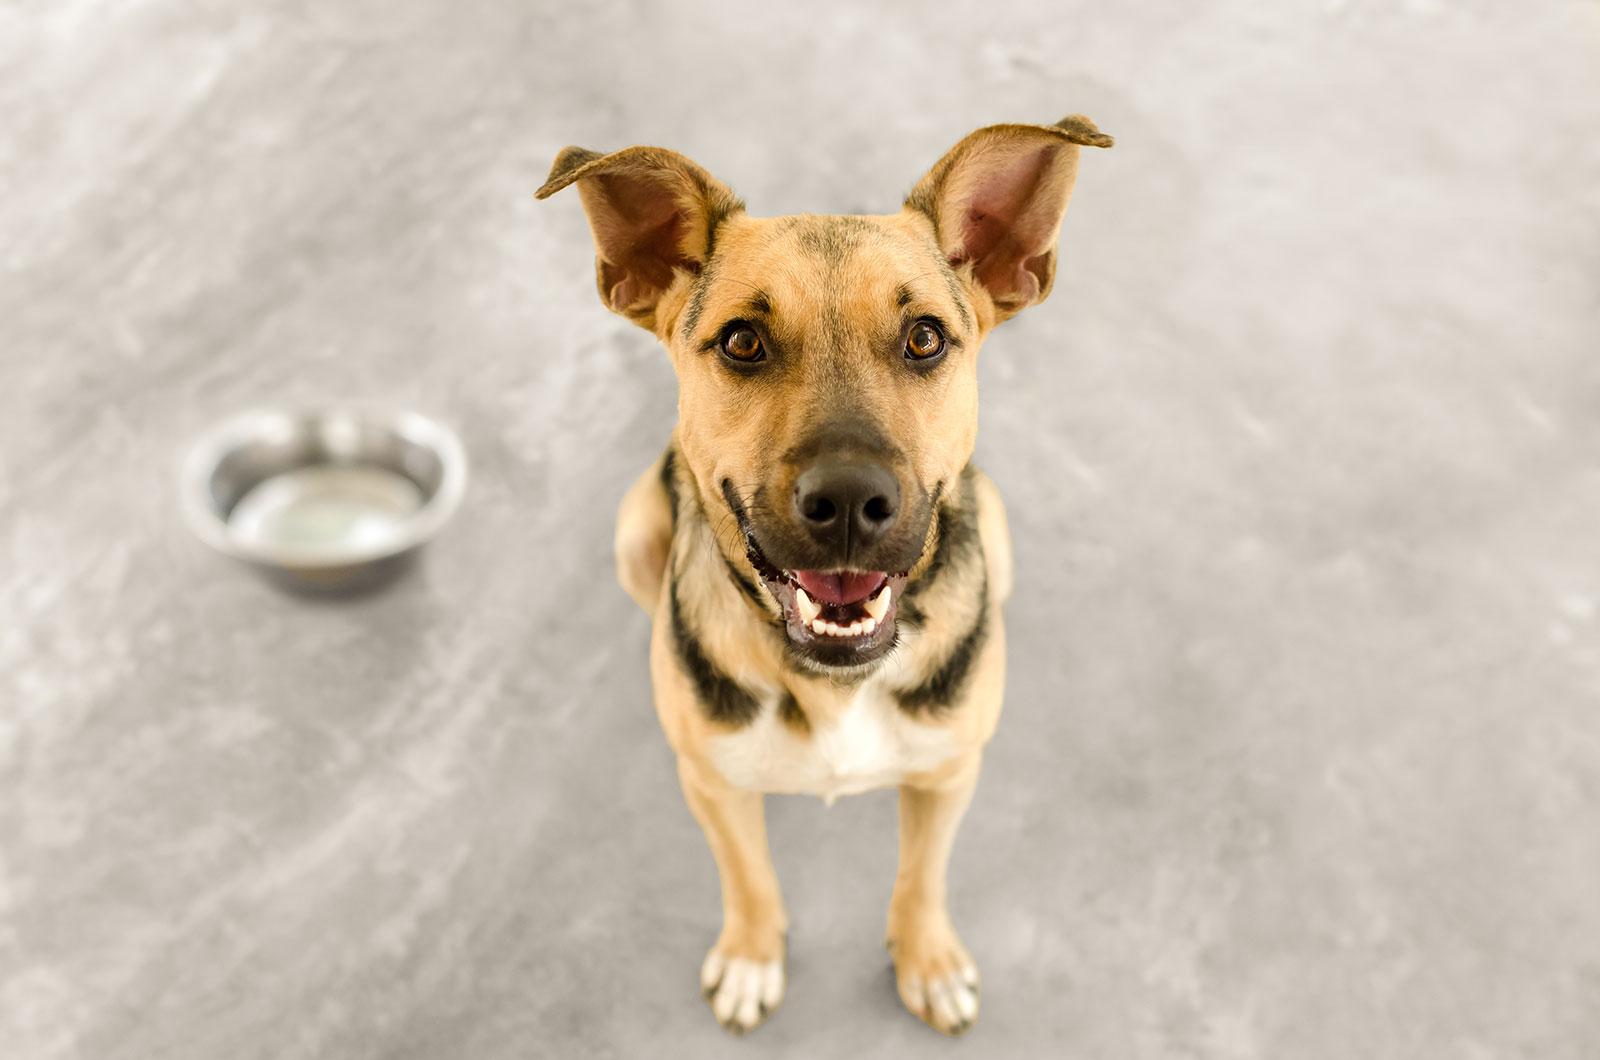 Welcome_Home_CBD_Rescue_Pets_4_22_21-2-1600